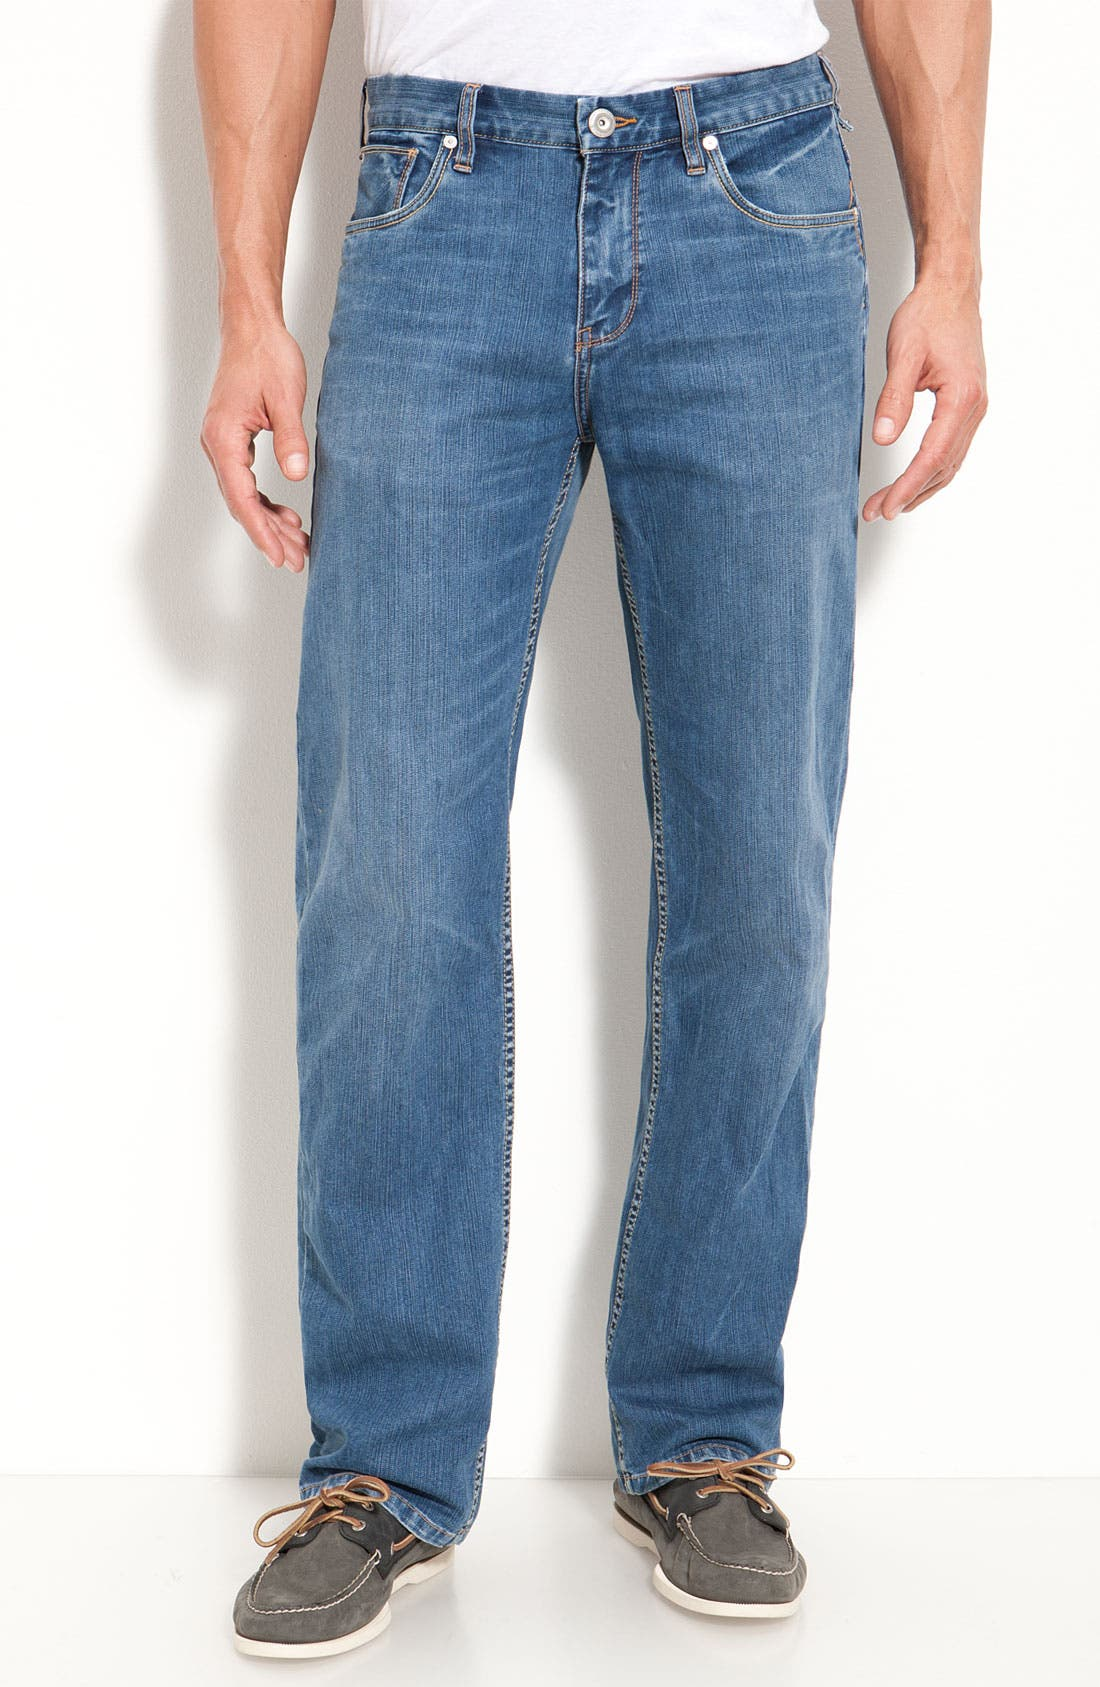 Main Image - Tommy Bahama Denim 'Calo' Standard Jeans (Medium Worn)(Big & Tall)